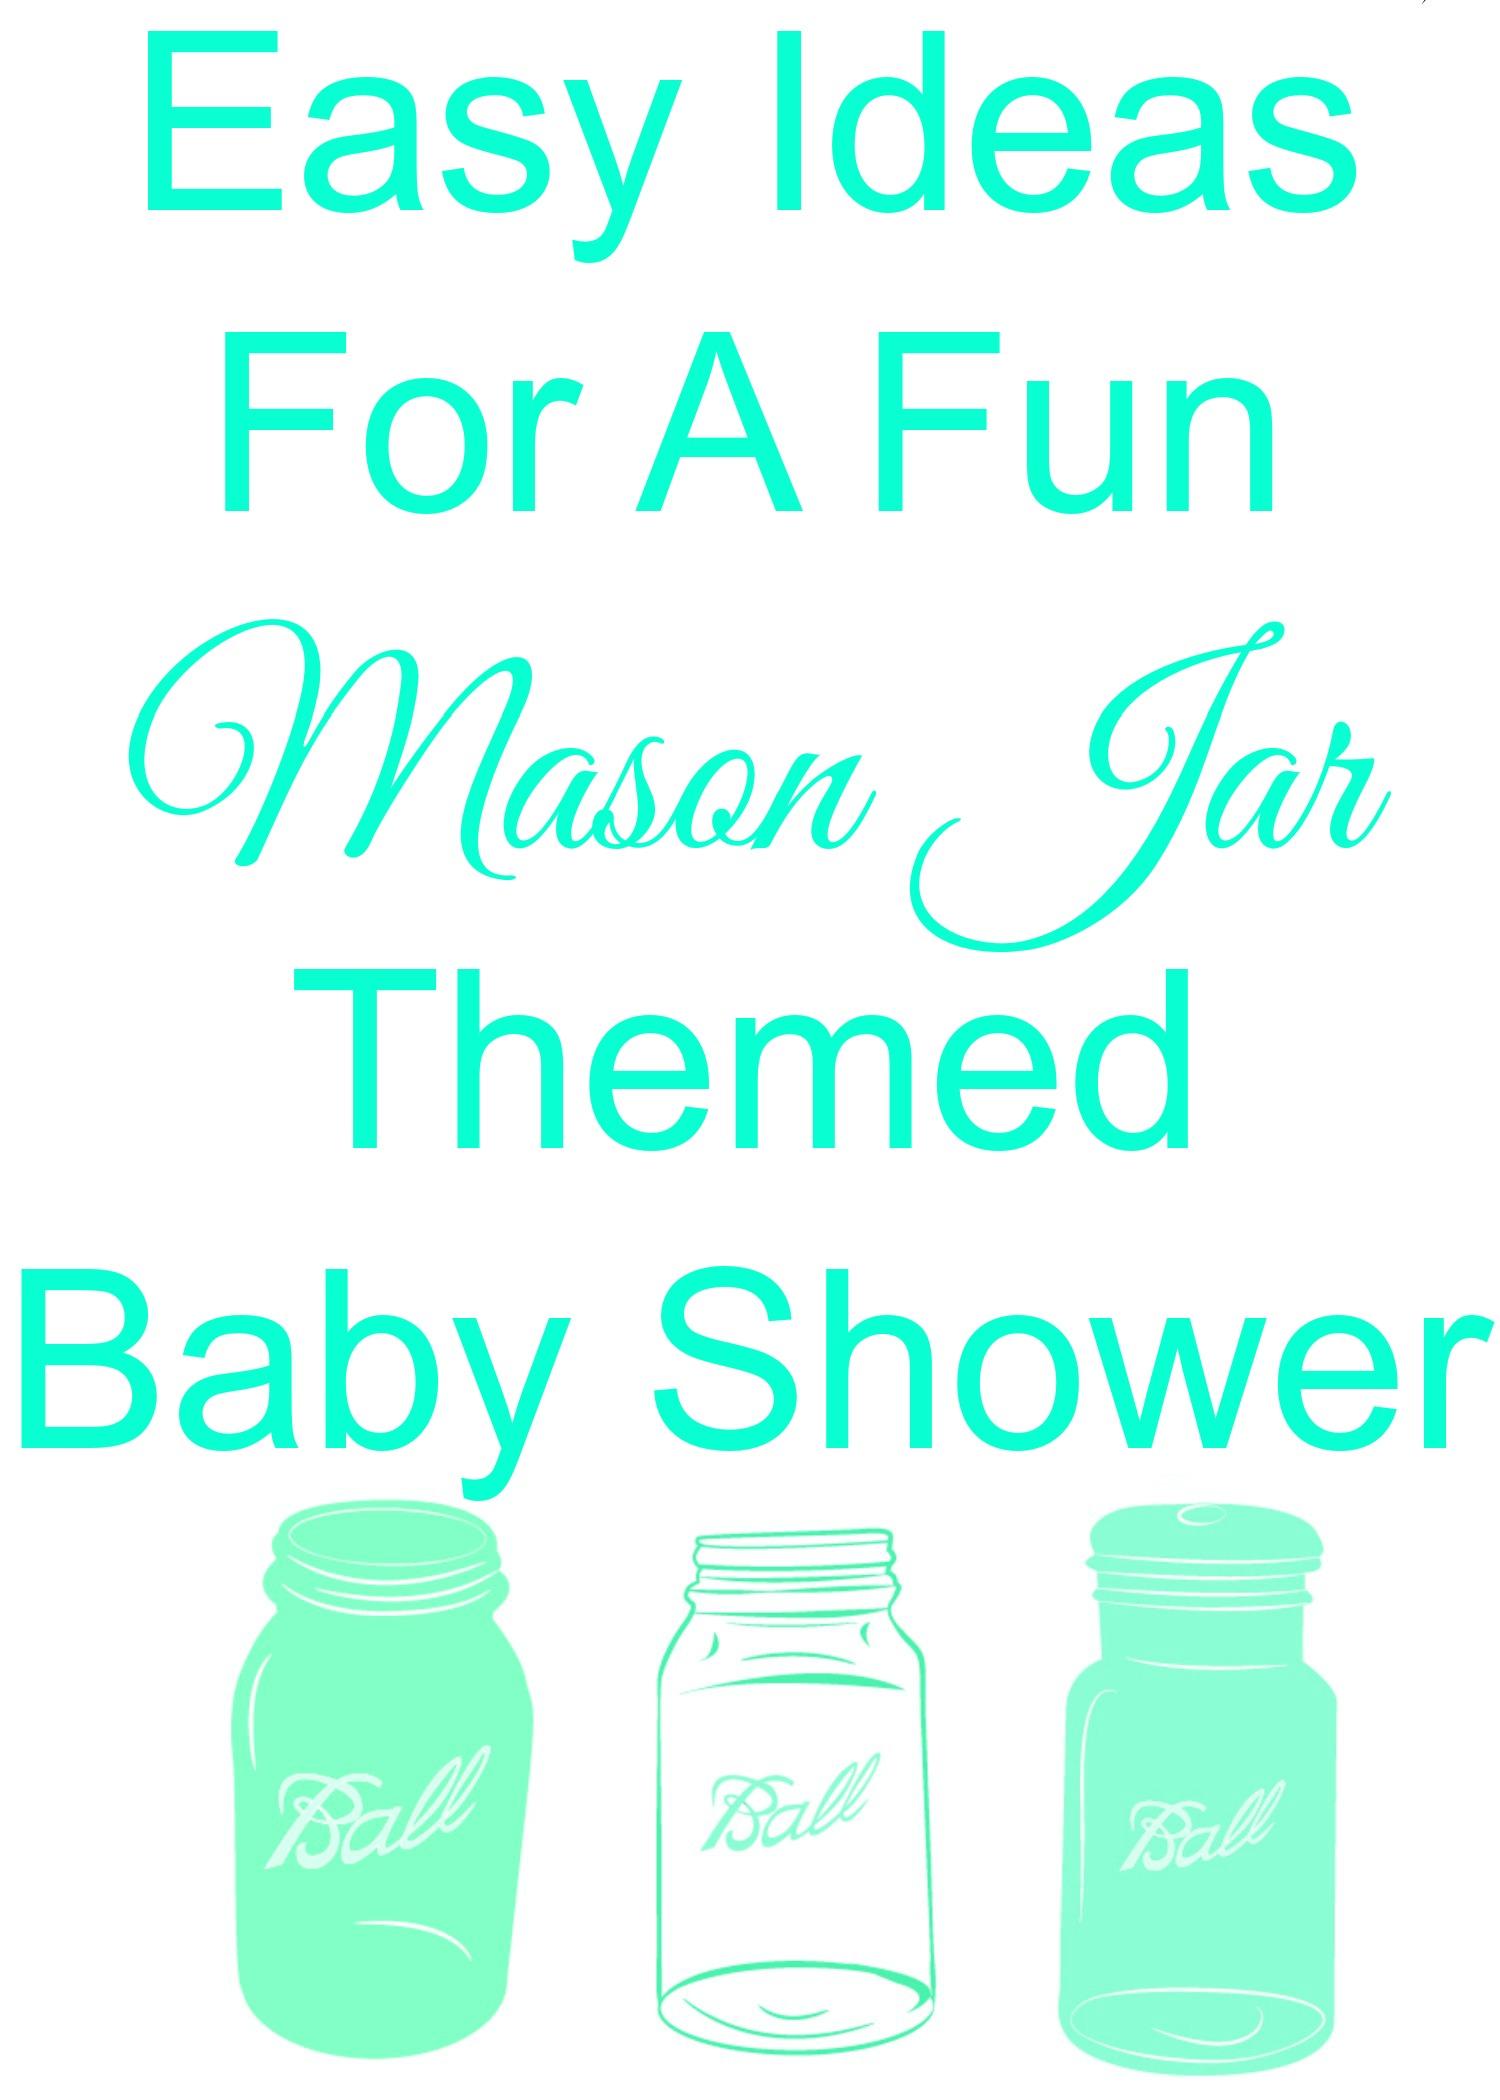 Mason Jar Baby Shower Rustic Baby Chic